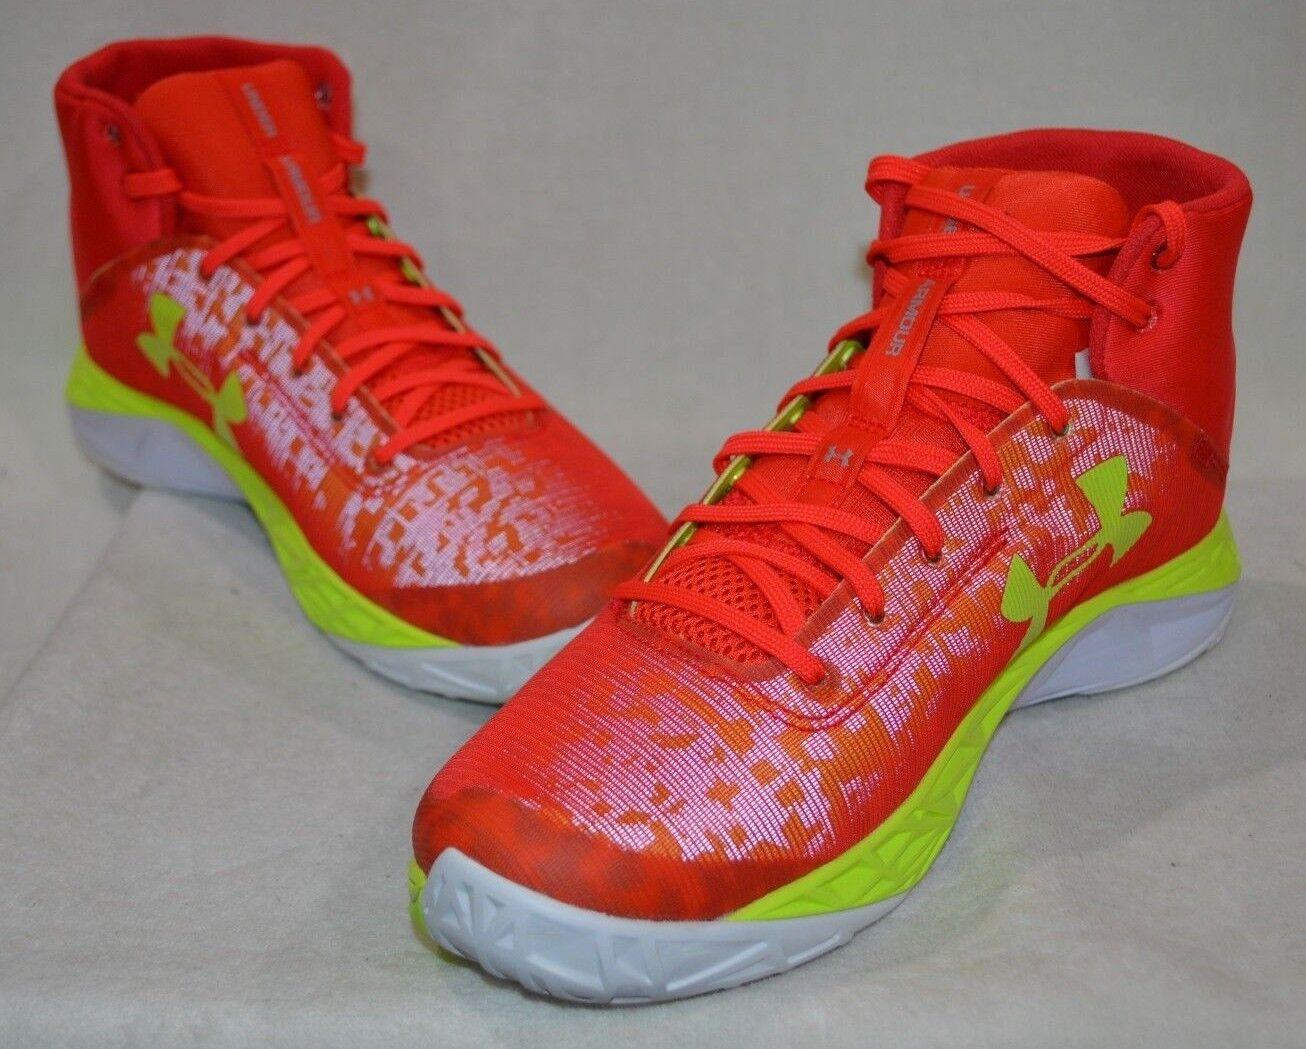 Under Under Under Armour UA Fire Shot rosso Volt bianca Uomo Basketball scarpe-Asst Dimensiones  NWB 6864b0